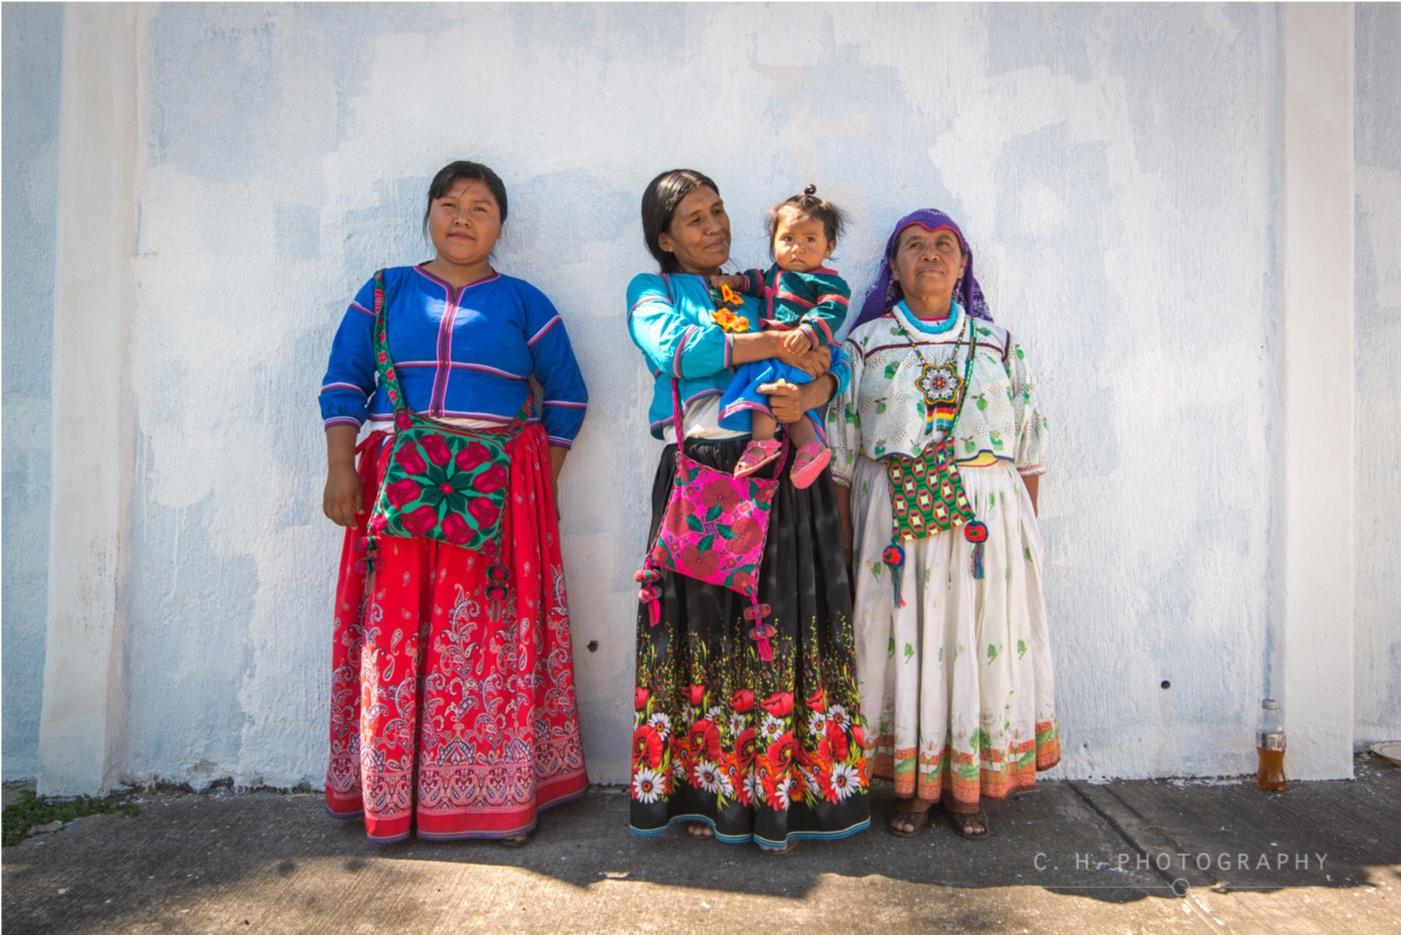 Guadalajara - Mexico